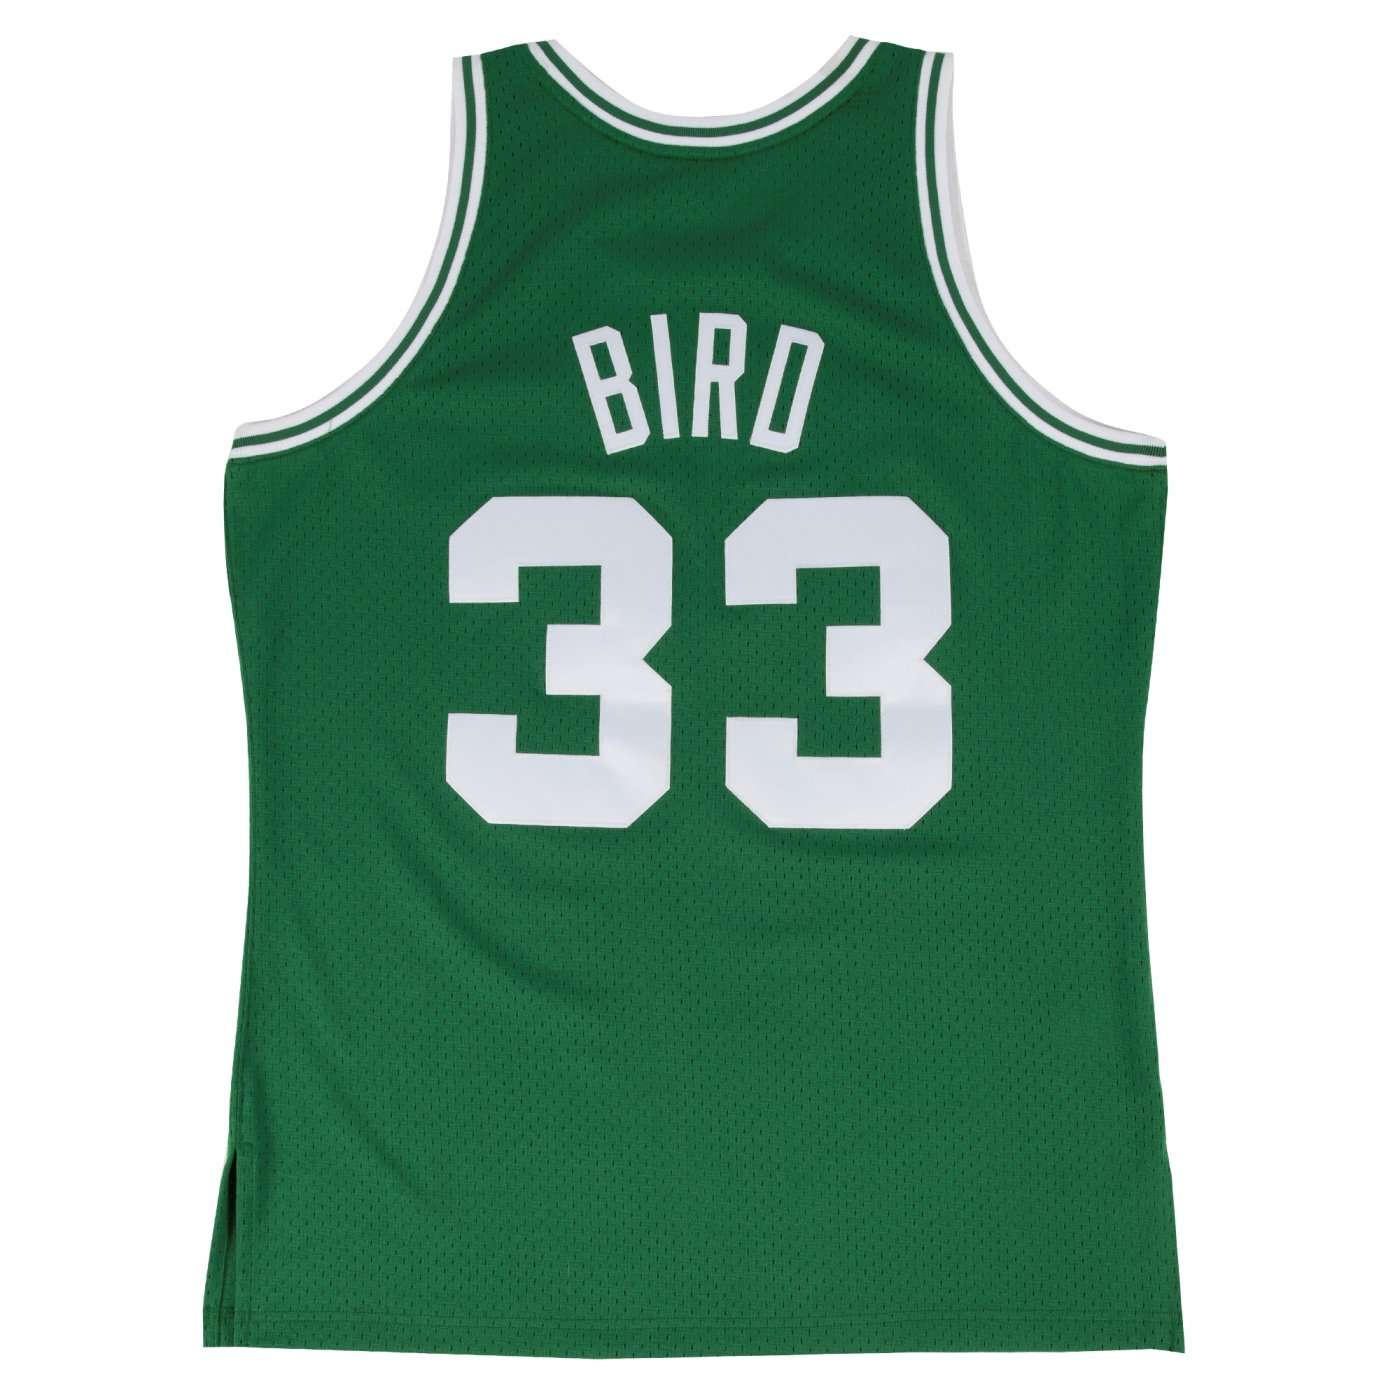 34efb0e433a Amazon.com : Larry Bird Boston Celtics Mitchell and Ness Men's Green  Throwback Jesey : Sports & Outdoors